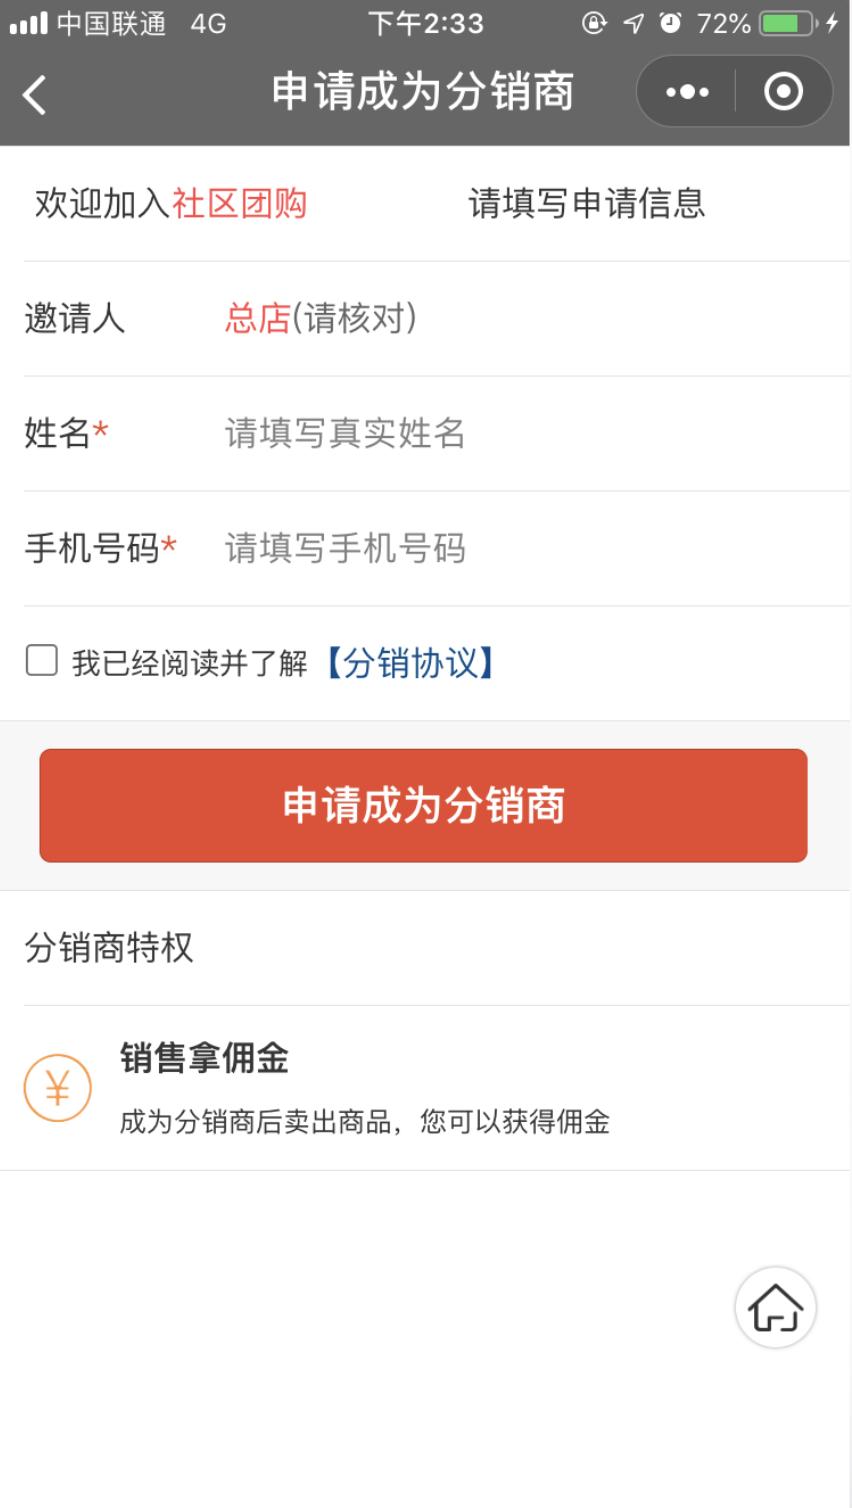 ../../Downloads/社区团购小程序/应用专区/申请成为分销商.png